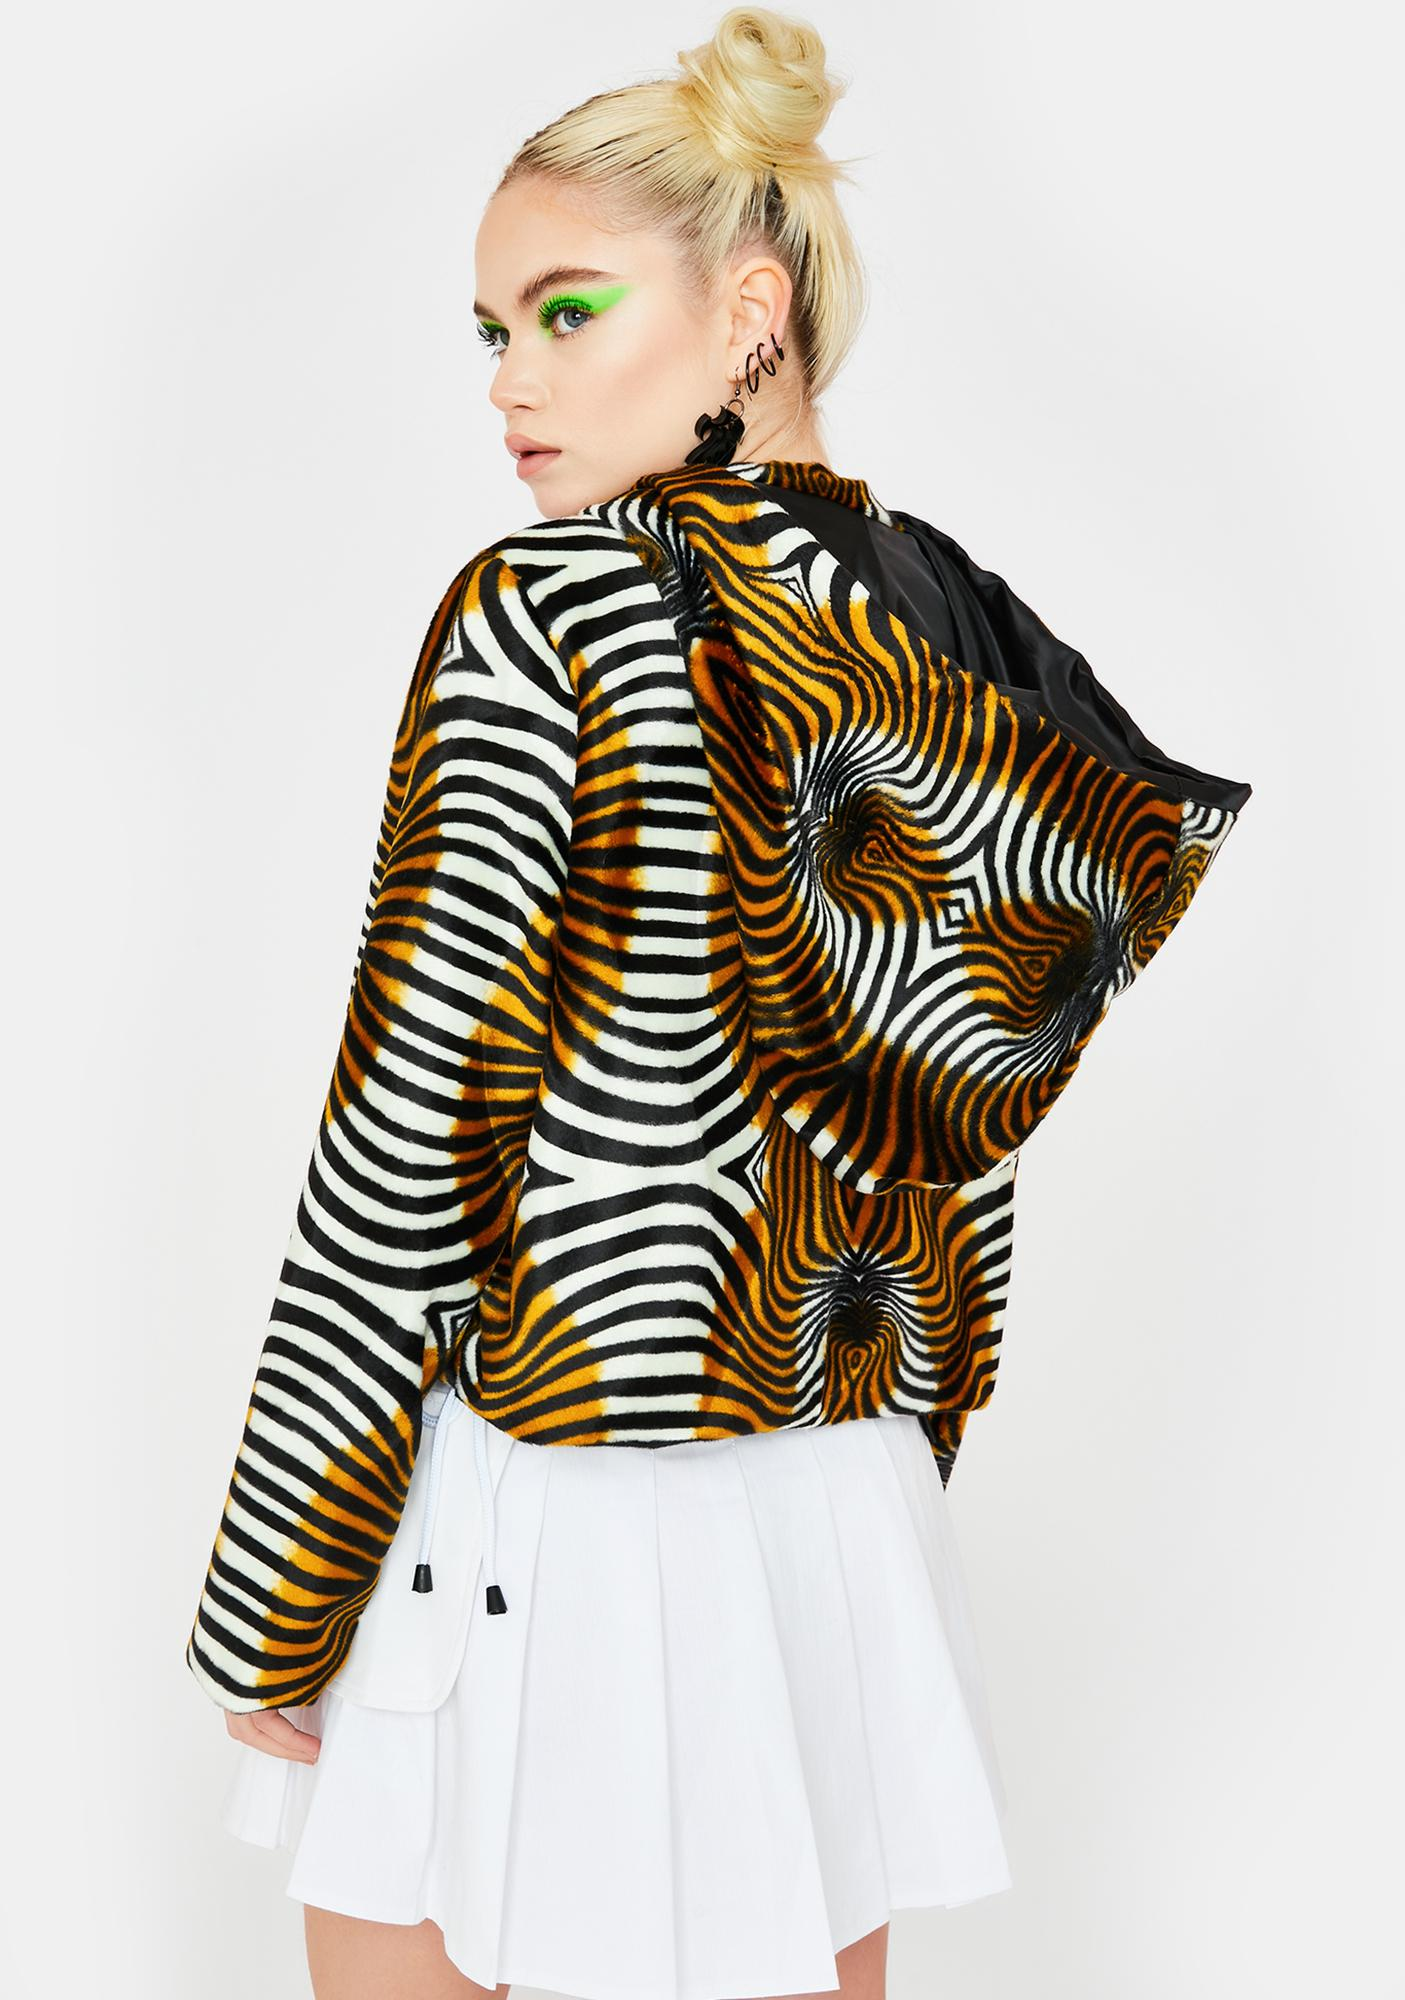 Ivy Berlin Trippy Tiger Faux Fur Jacket